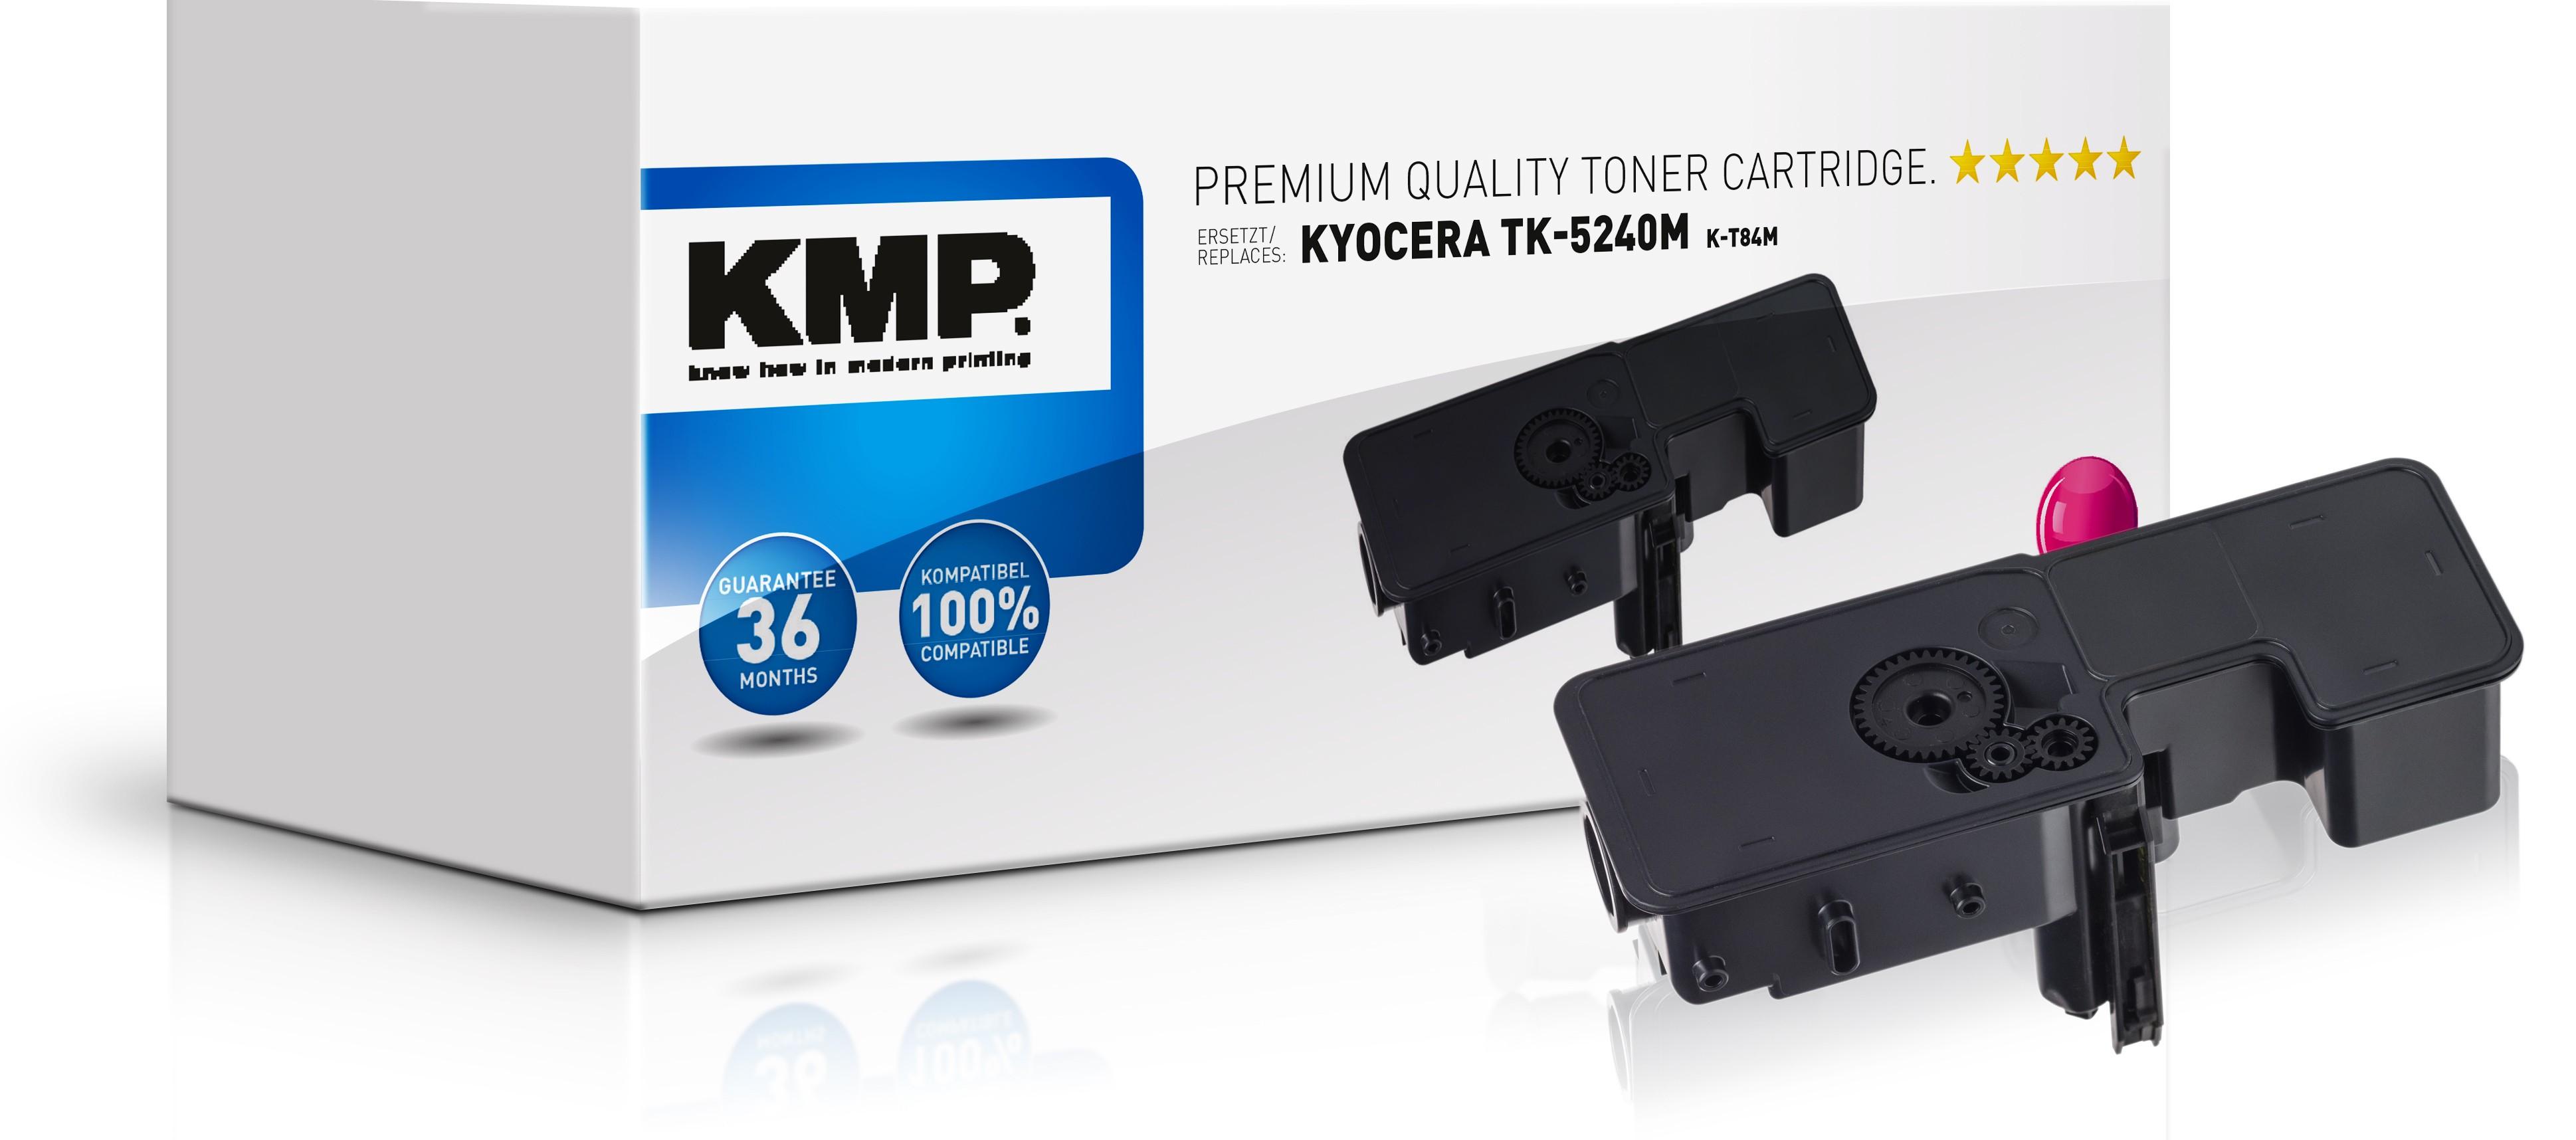 KMP K-T84M - 3000 Seiten - Magenta - 1 Stück(e)